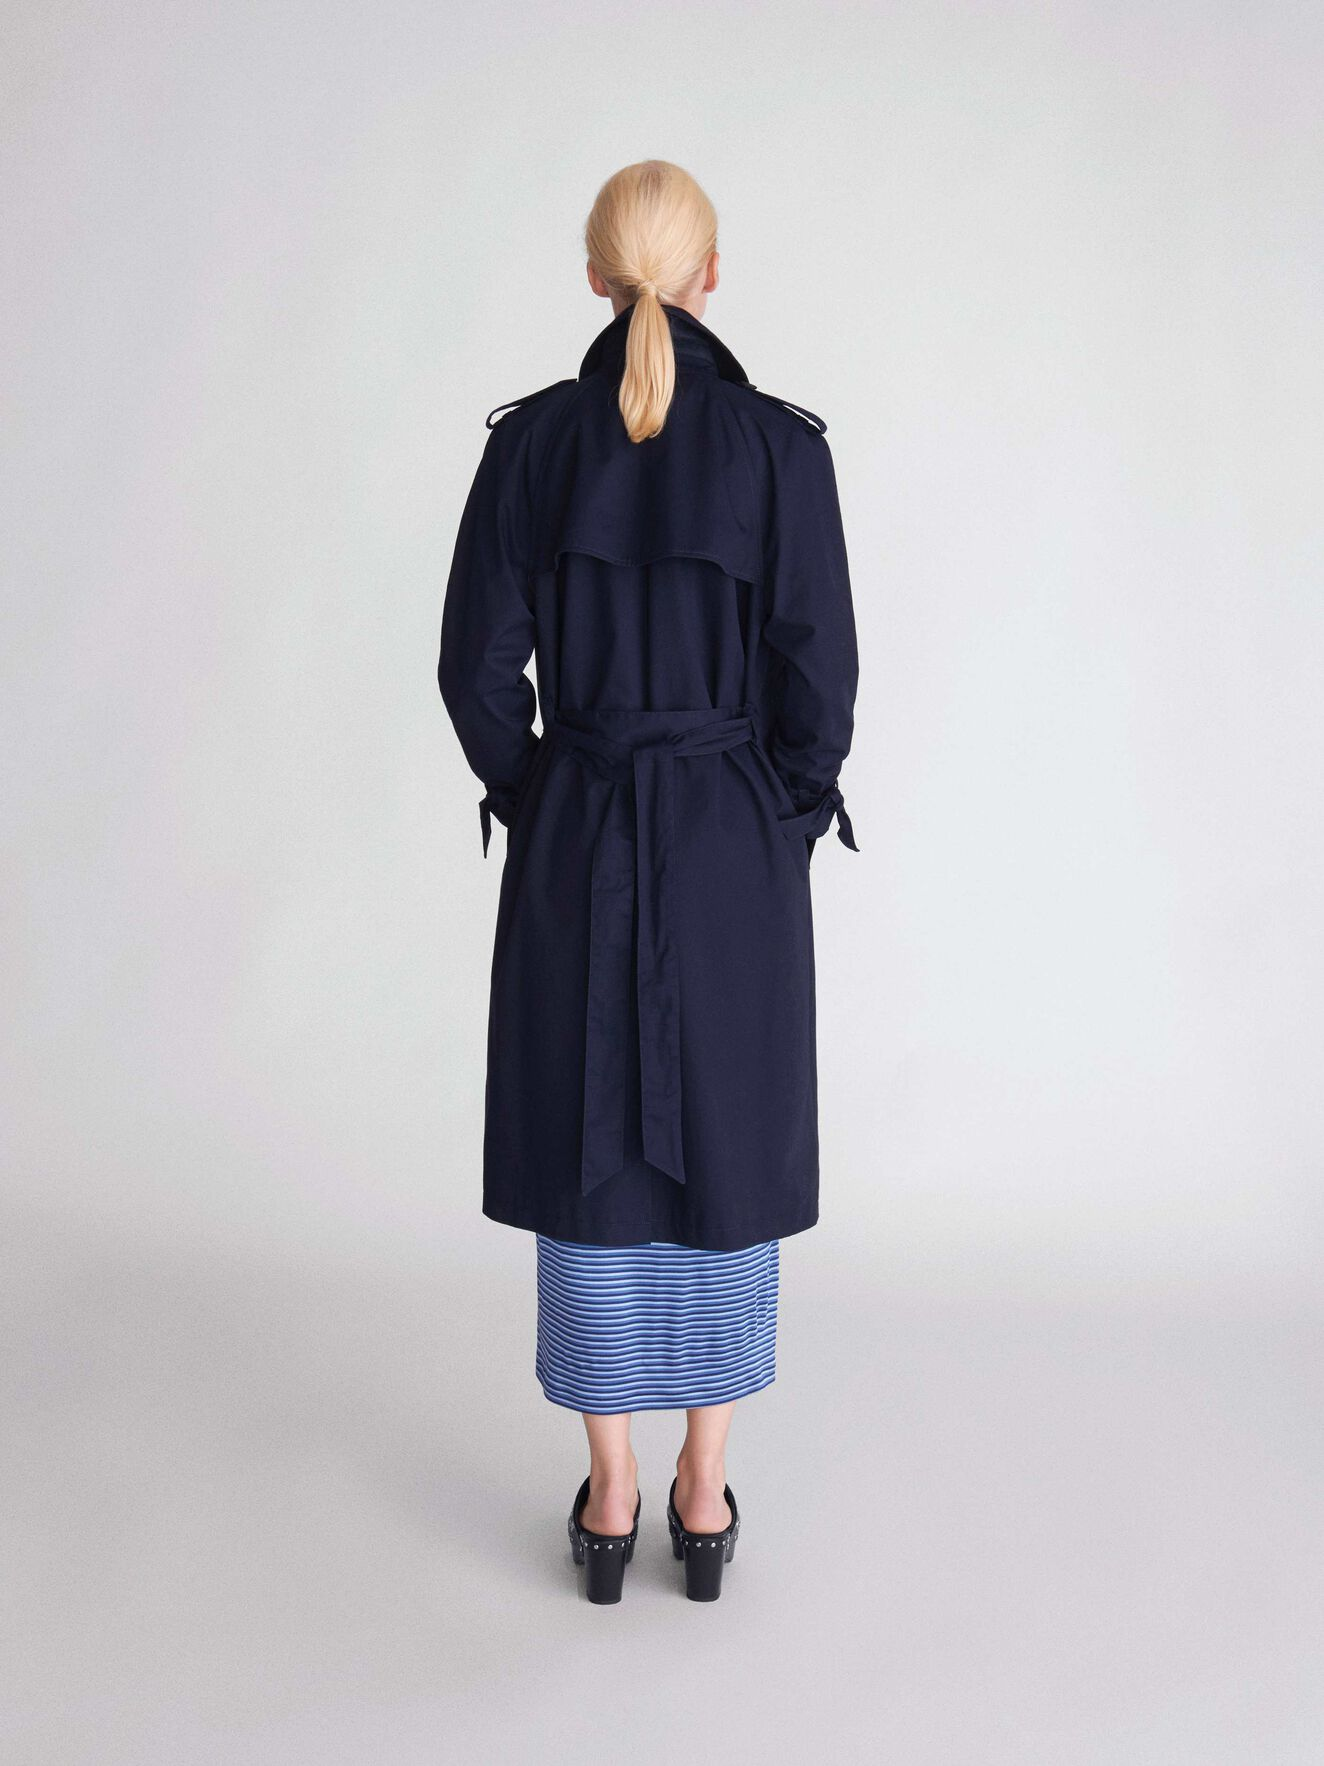 Torii Coat in Blue from Tiger of Sweden